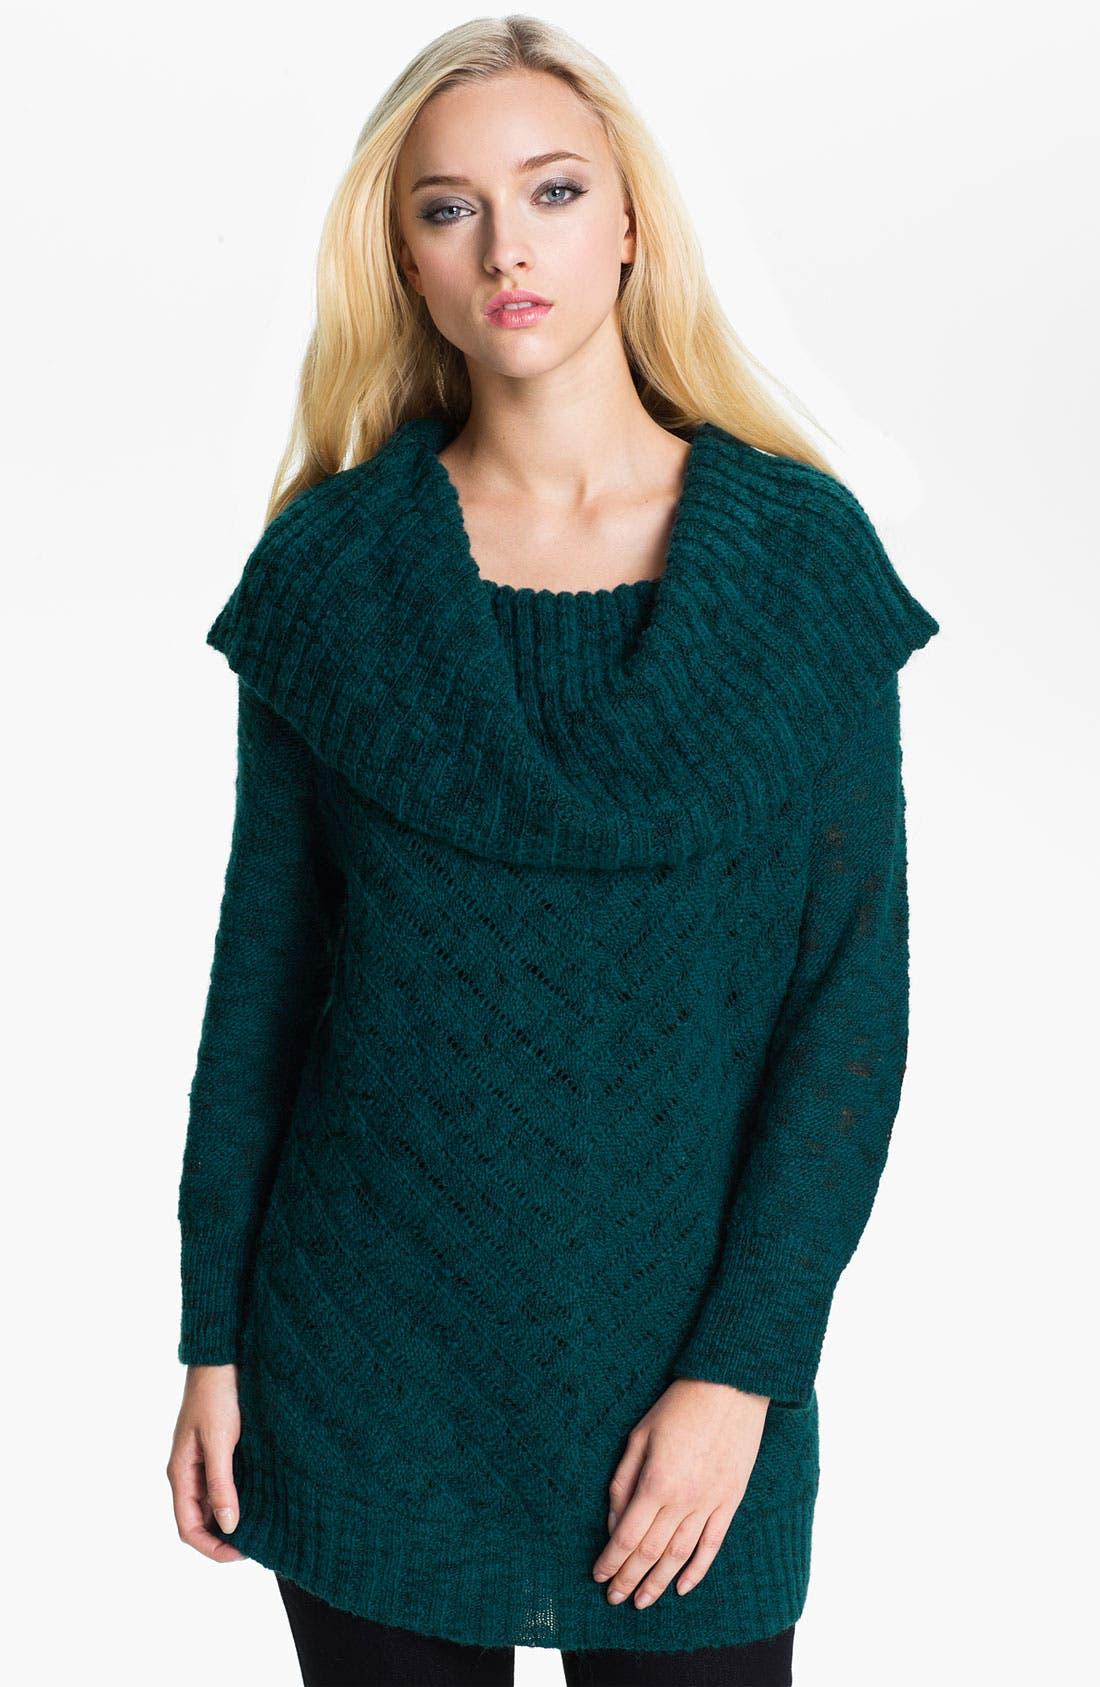 Alternate Image 1 Selected - Holistia 'Carioca Flame' Cowl Neck Sweater